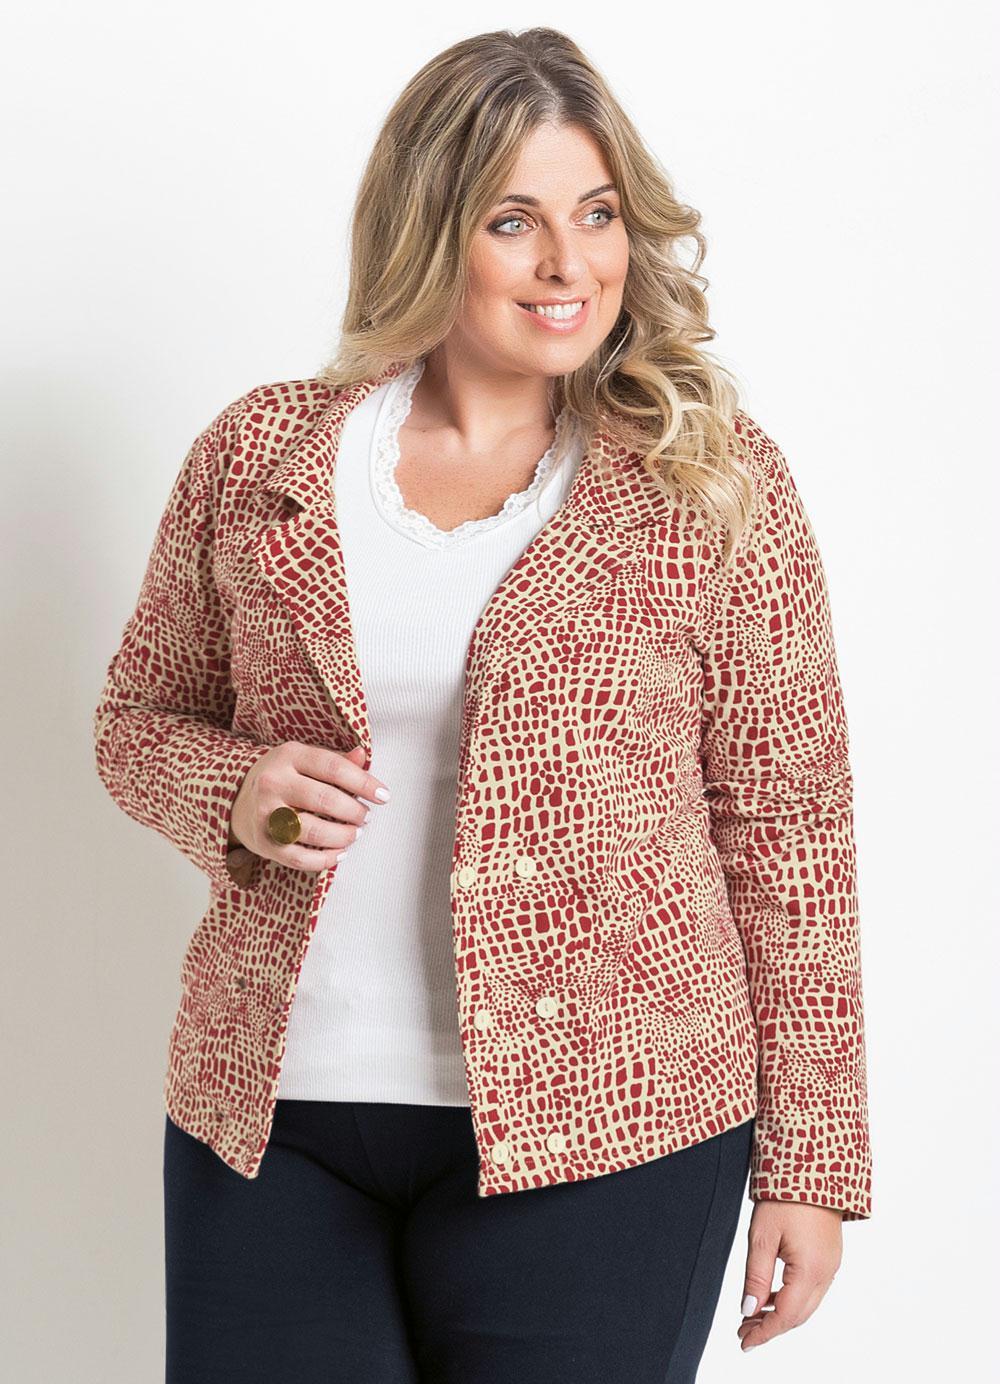 38b0accd6 Blazer Plus Size Feminino Estampado - Marguerite